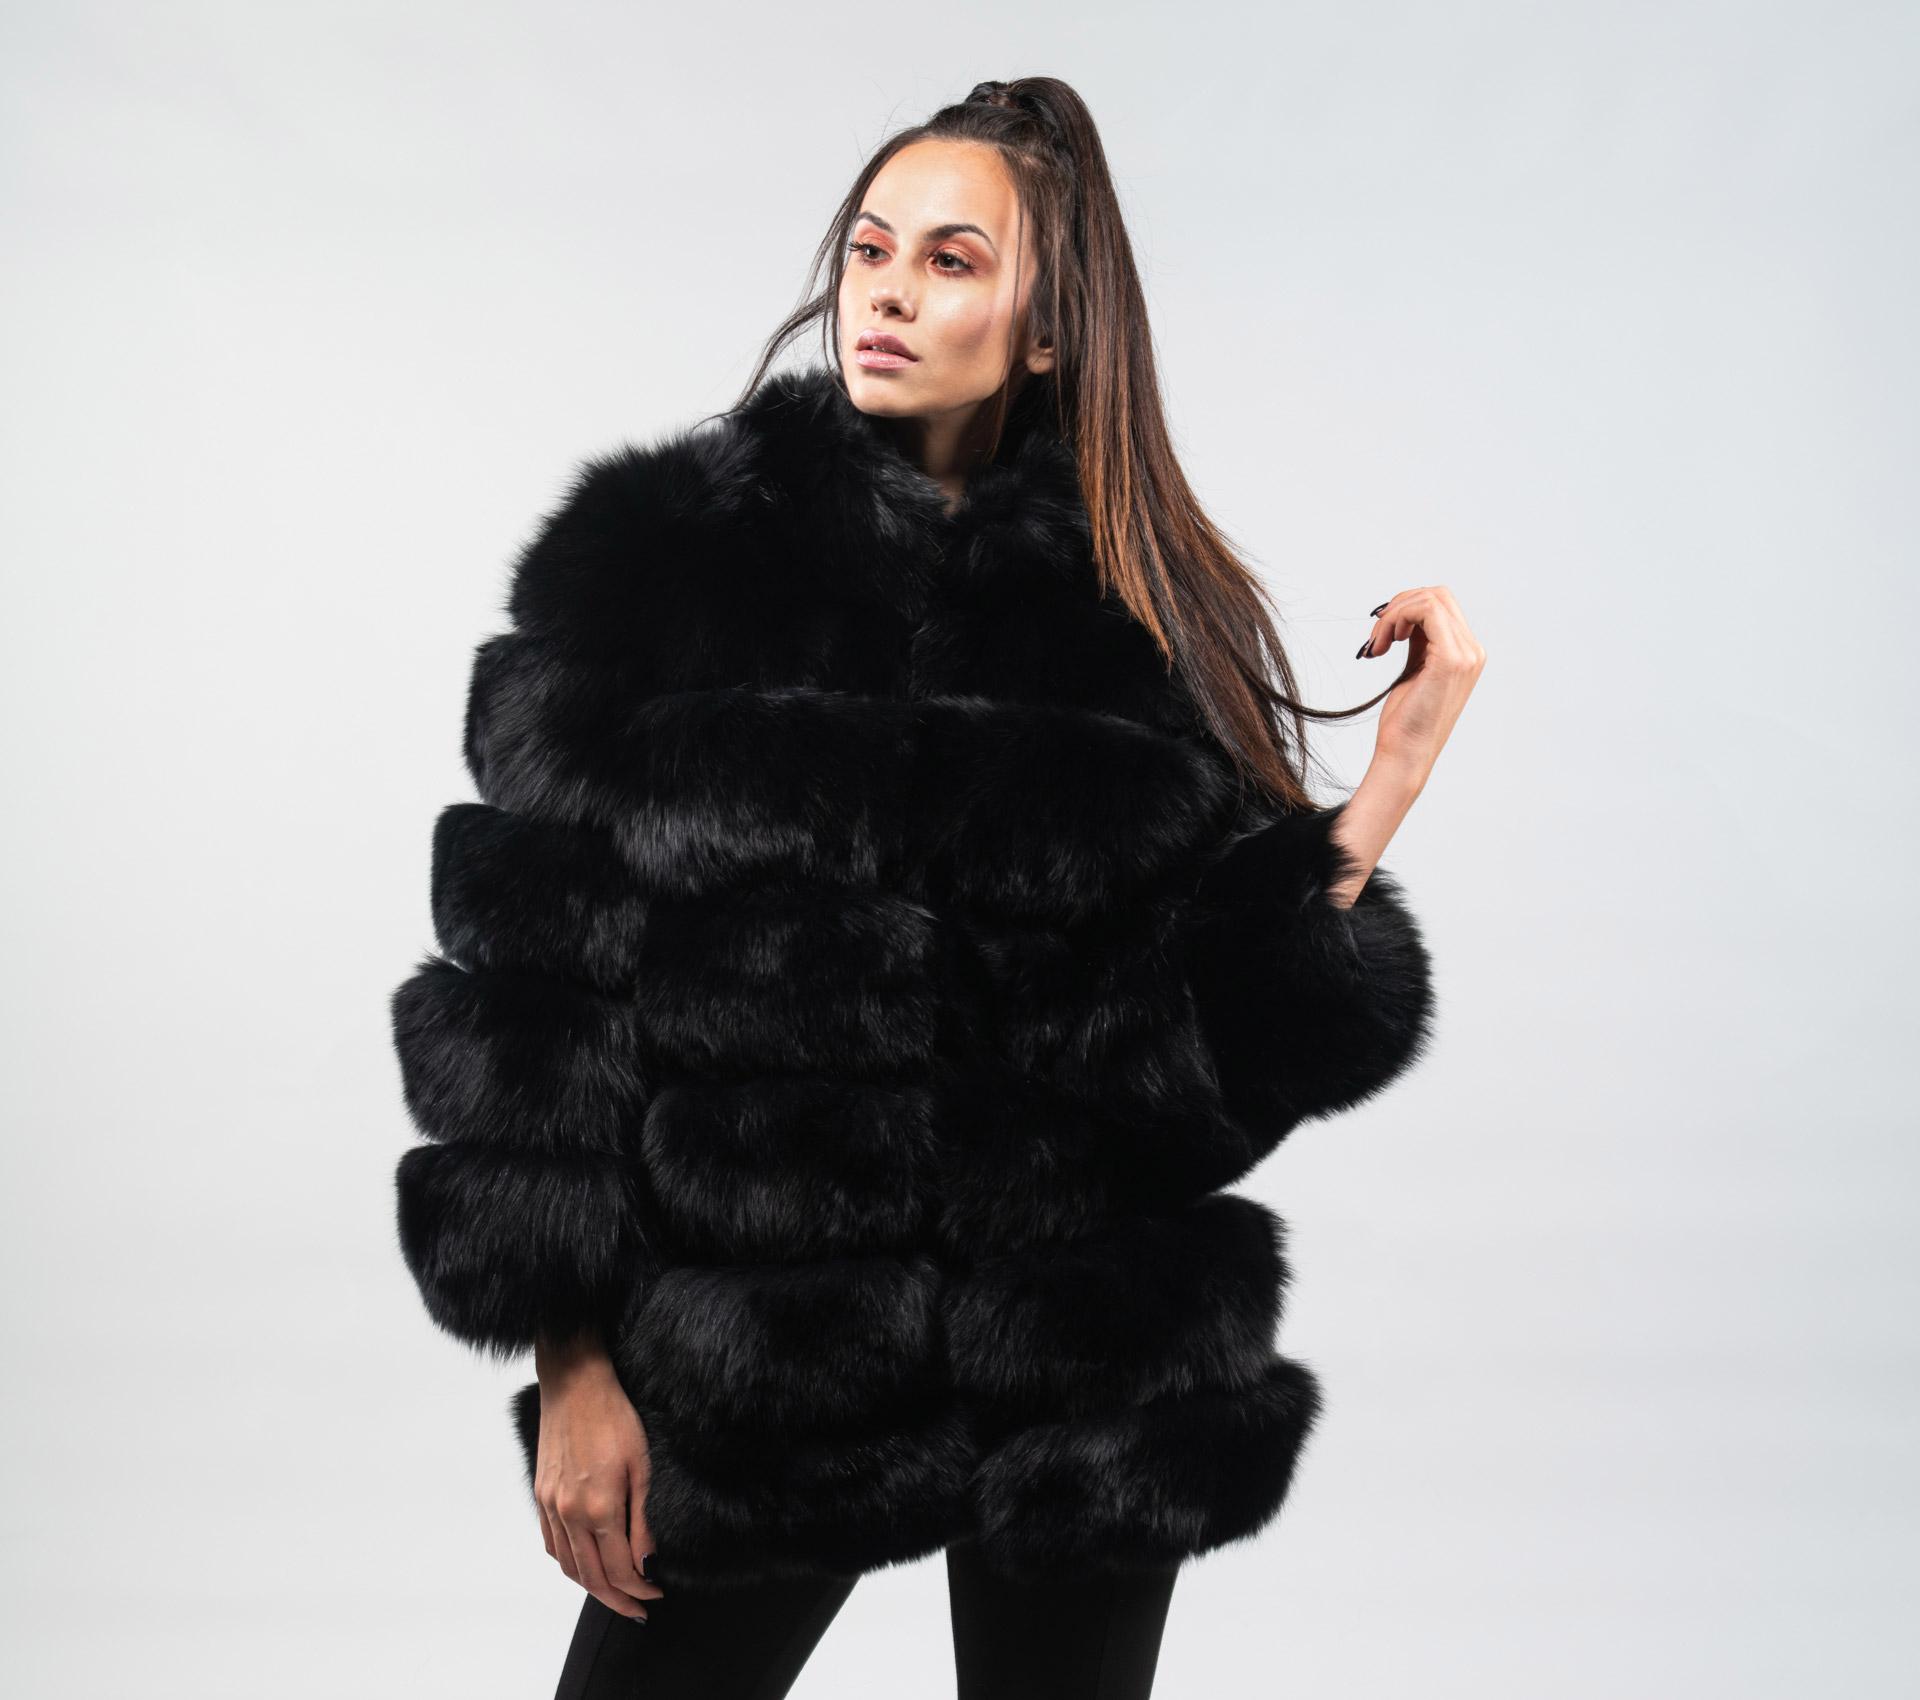 10abfa947 Black Fox Fur Jacket With 7/8 Sleeves-100% Real Fur - Haute Acorn